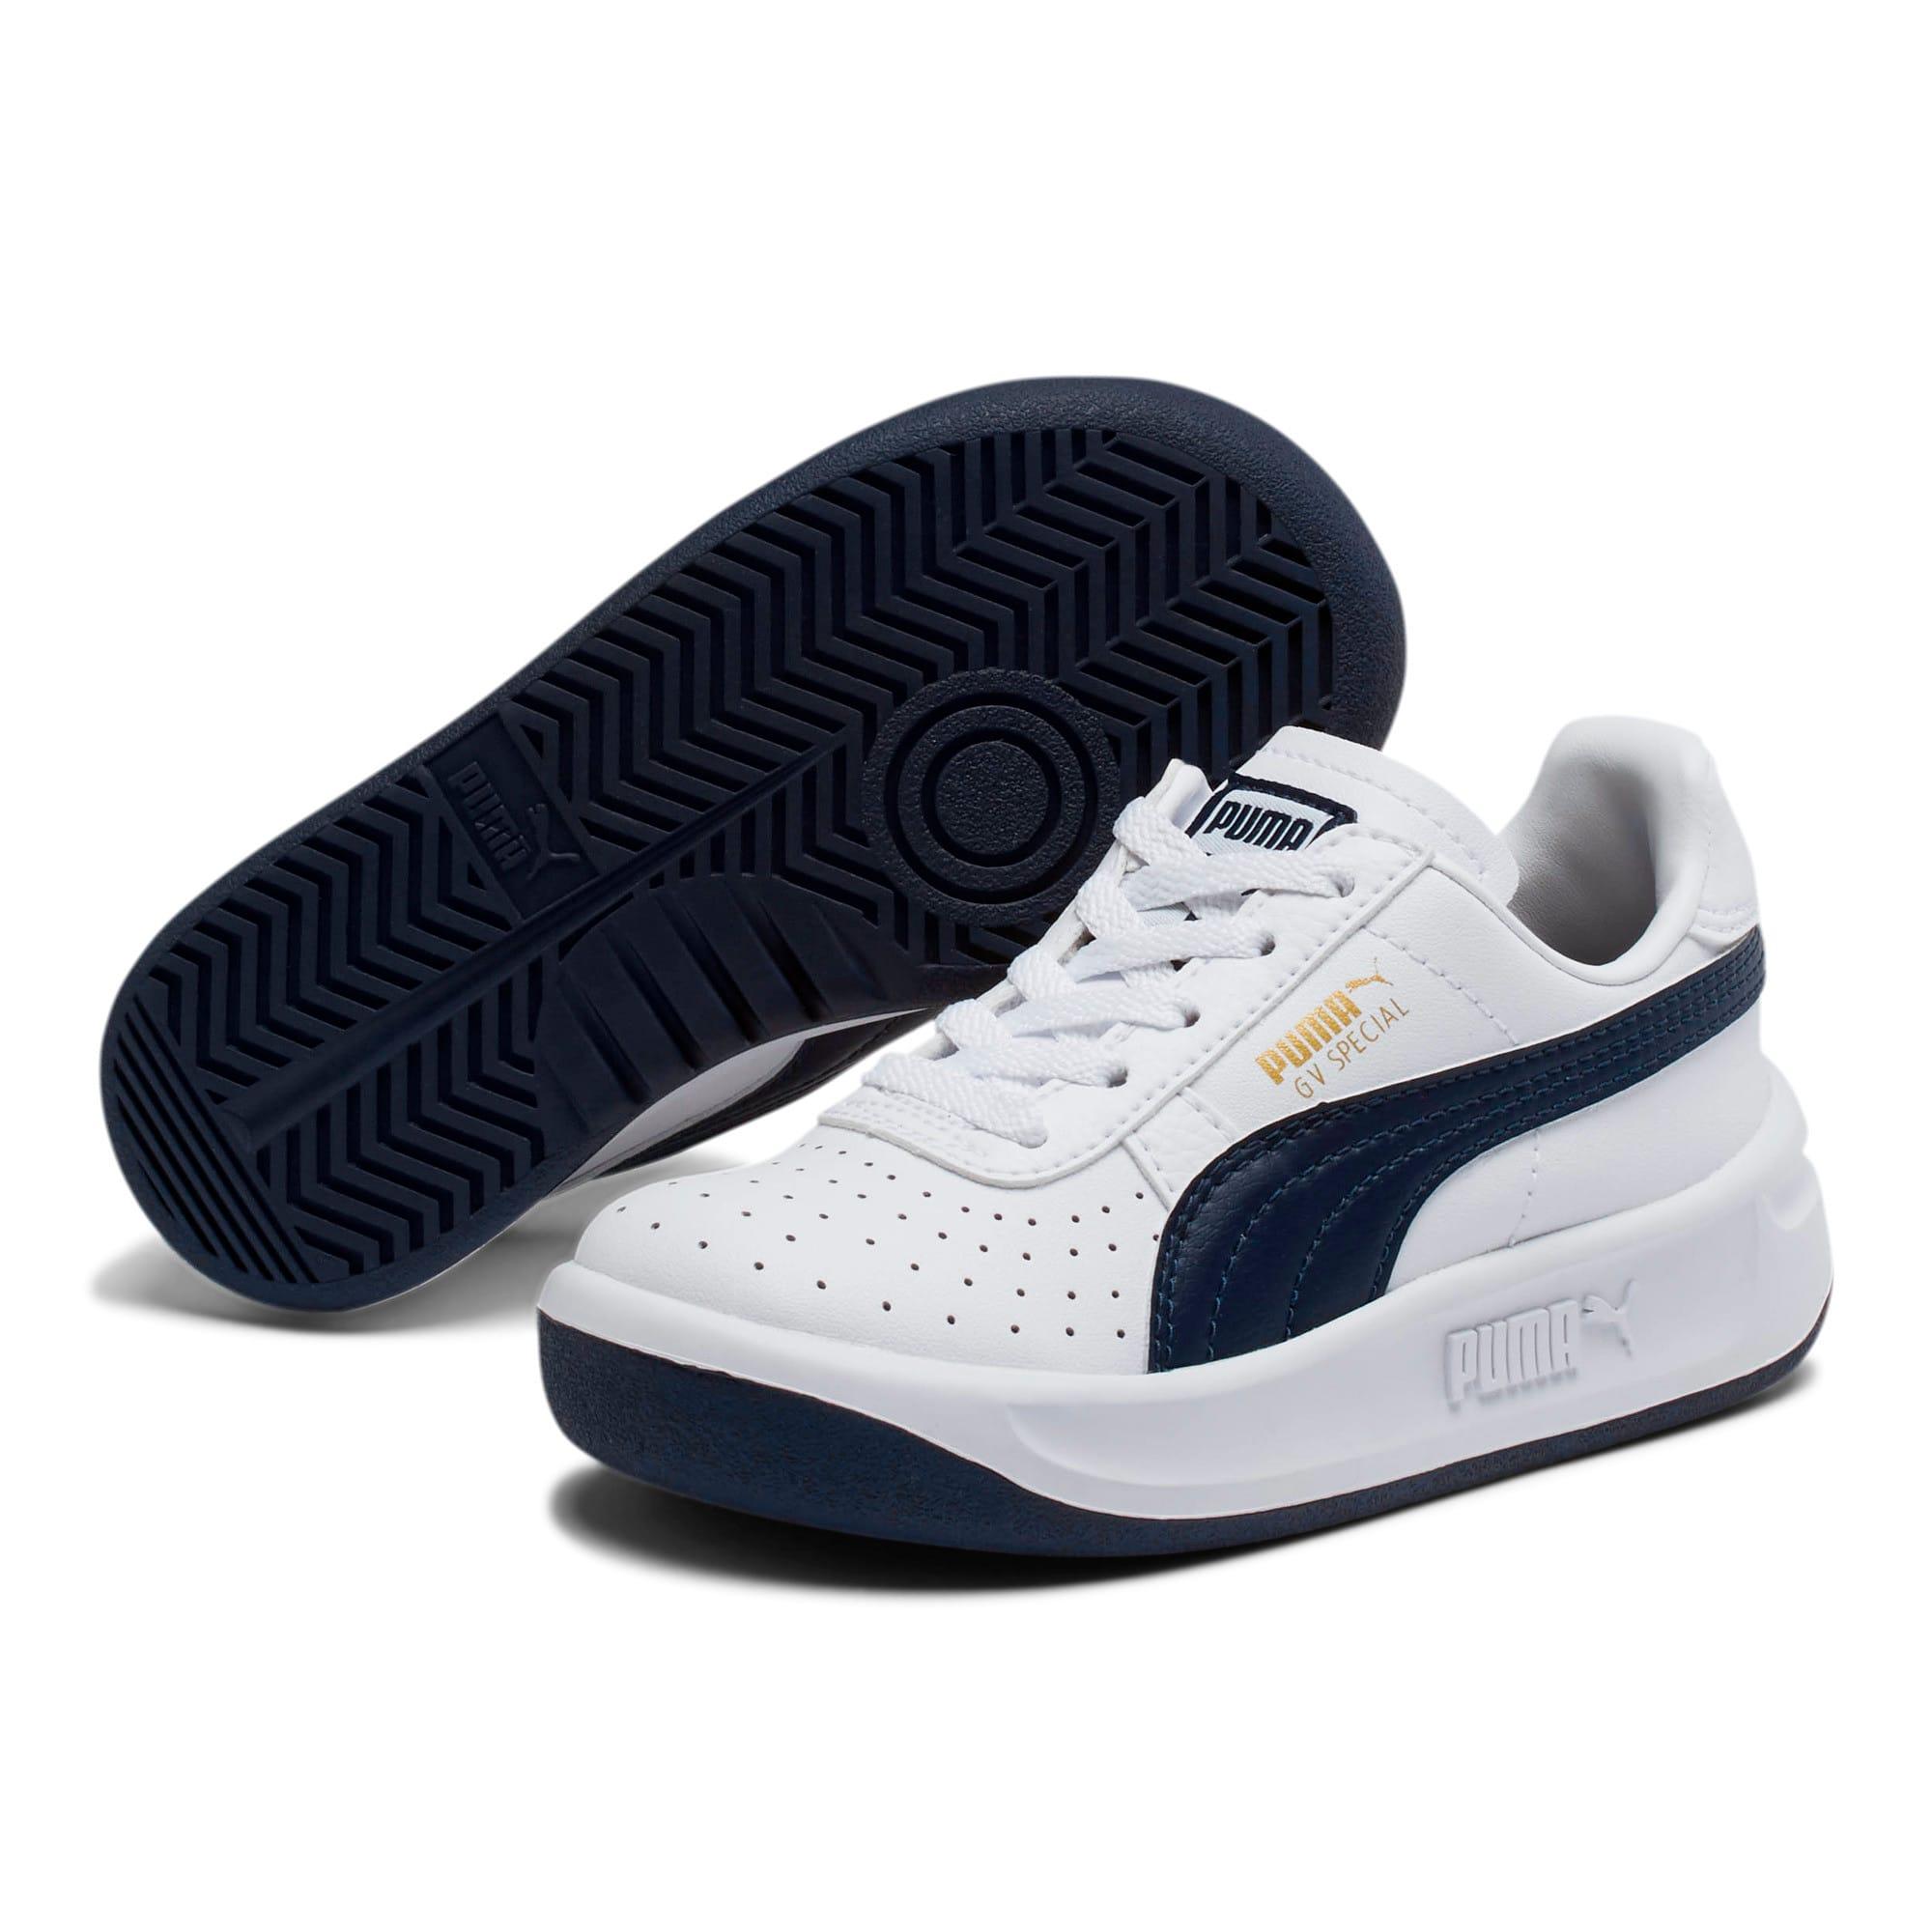 Thumbnail 2 of GV Special Little Kids' Shoes, Puma White-Peacoat, medium